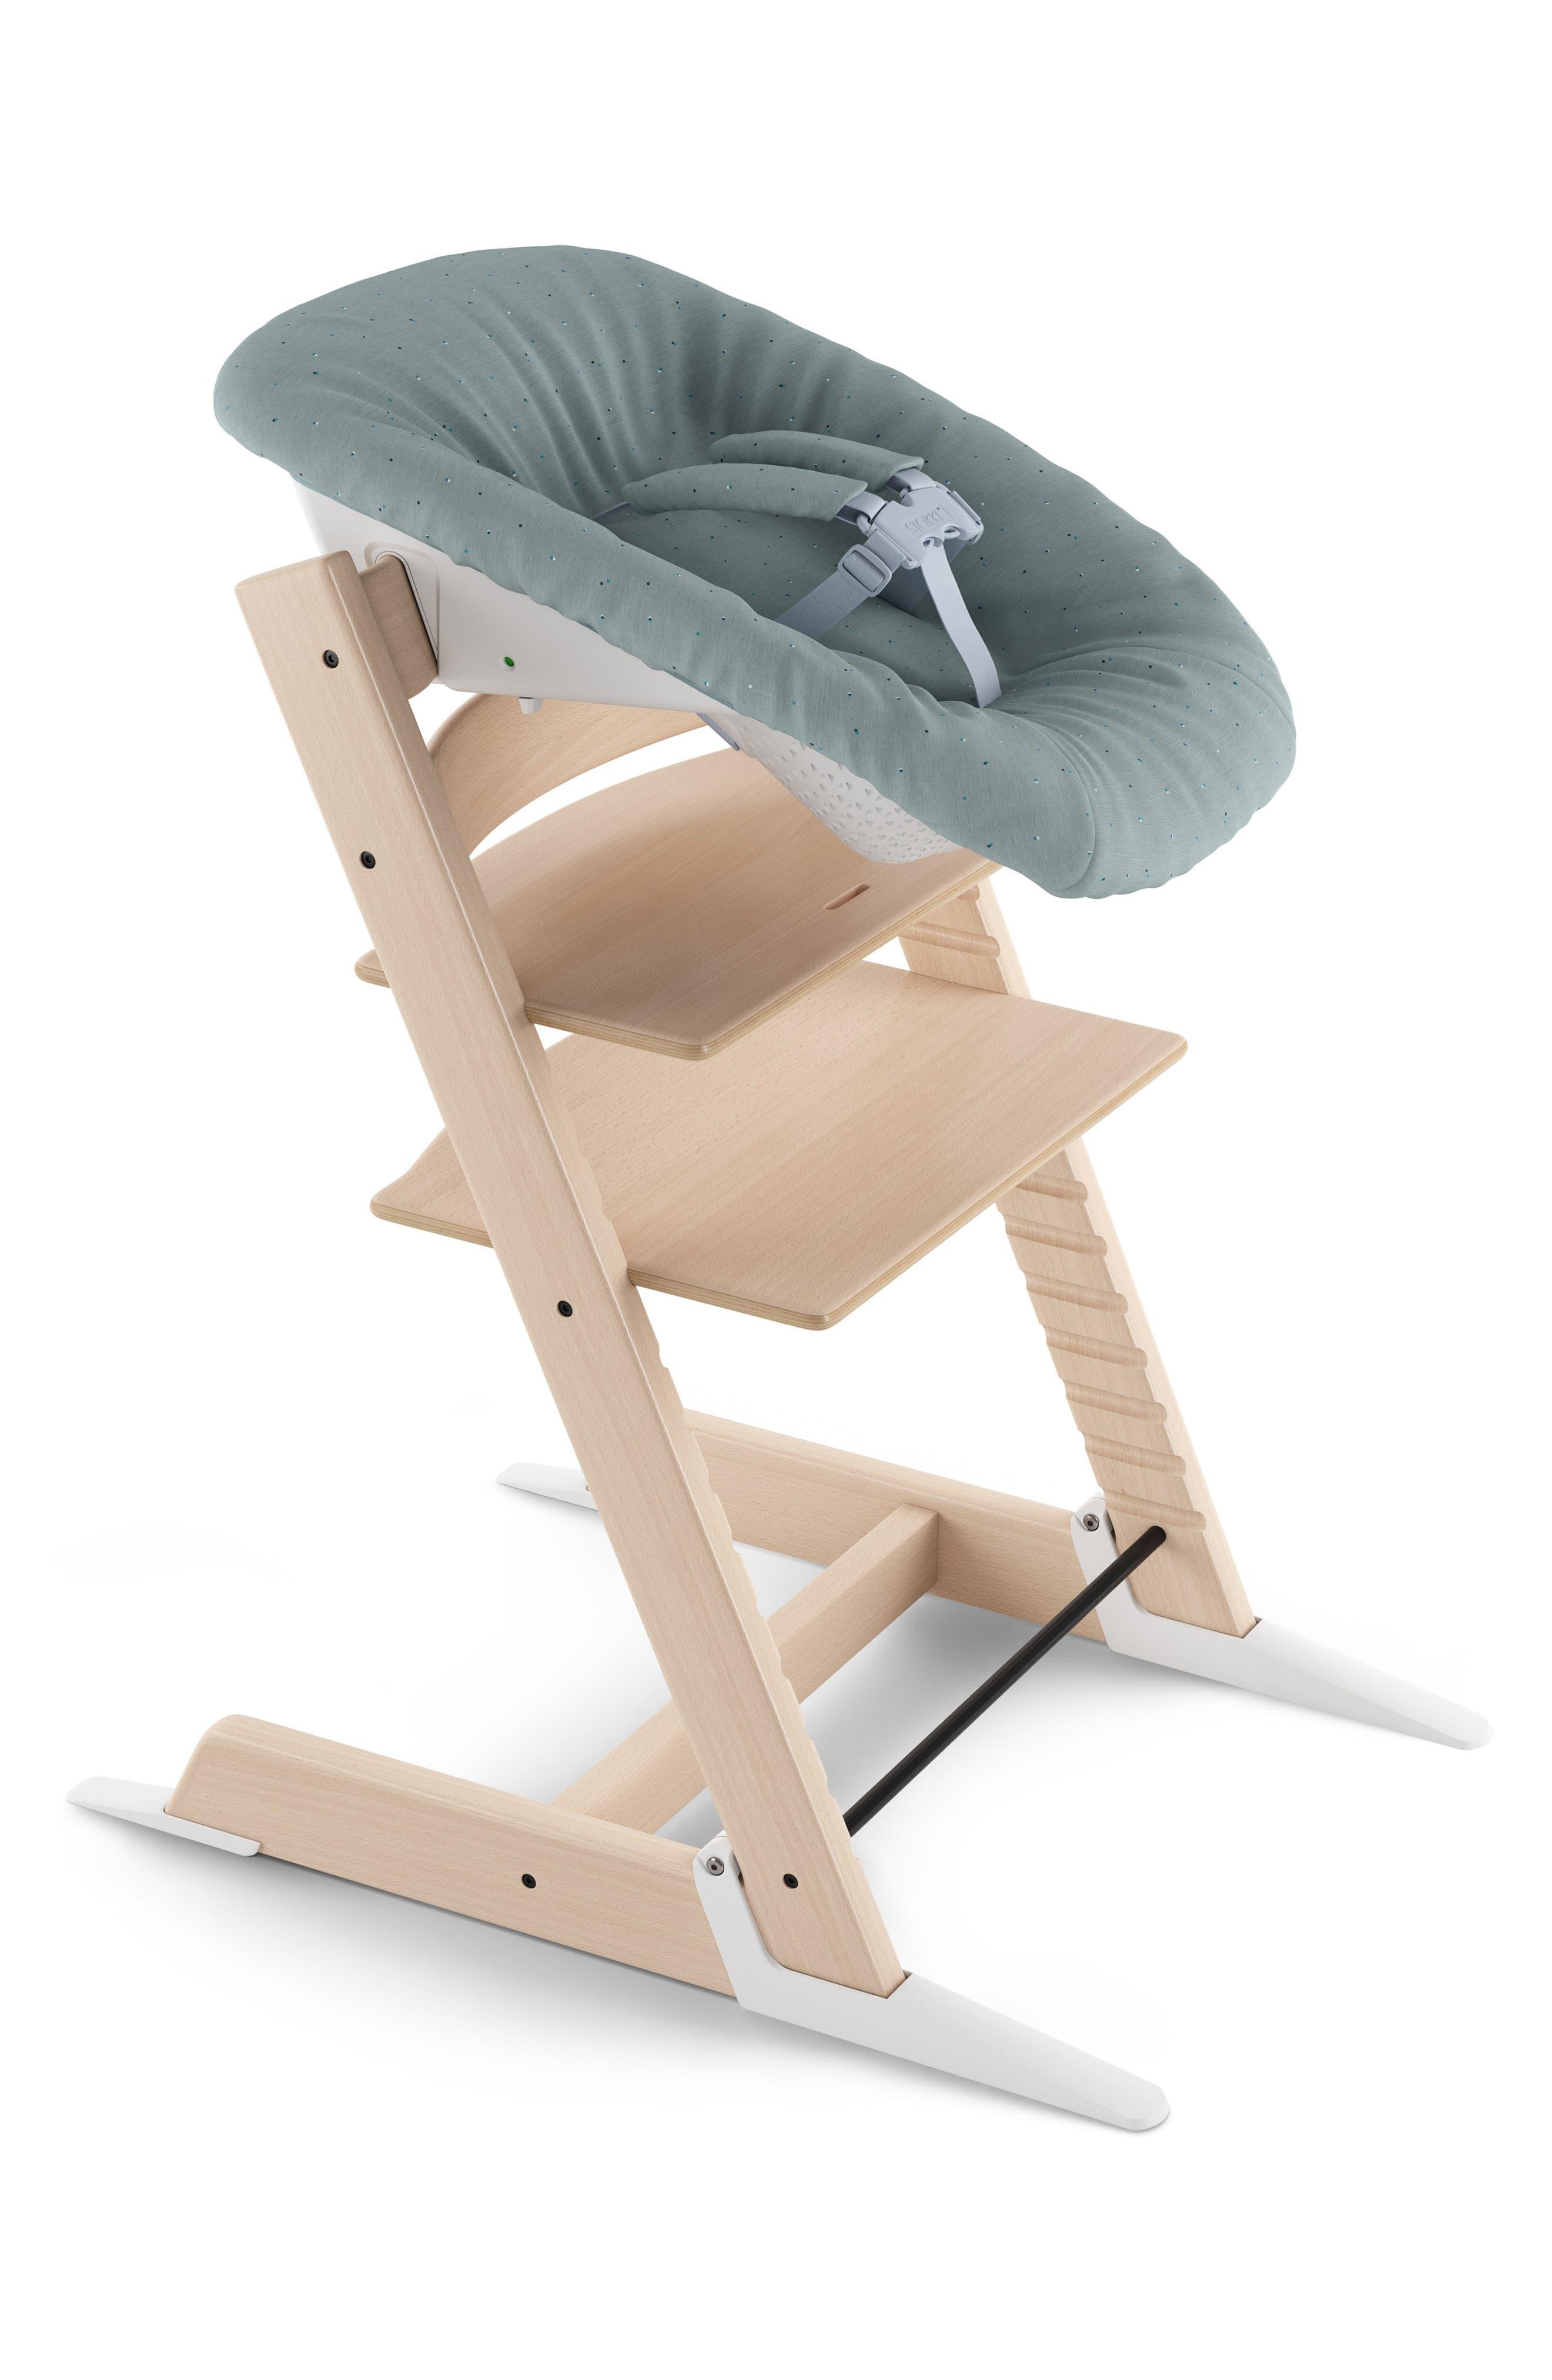 STOKKE Upholstery Cover for Tripp Trapp Newborn Set Attachment, Main, color, JADE CONFETTI